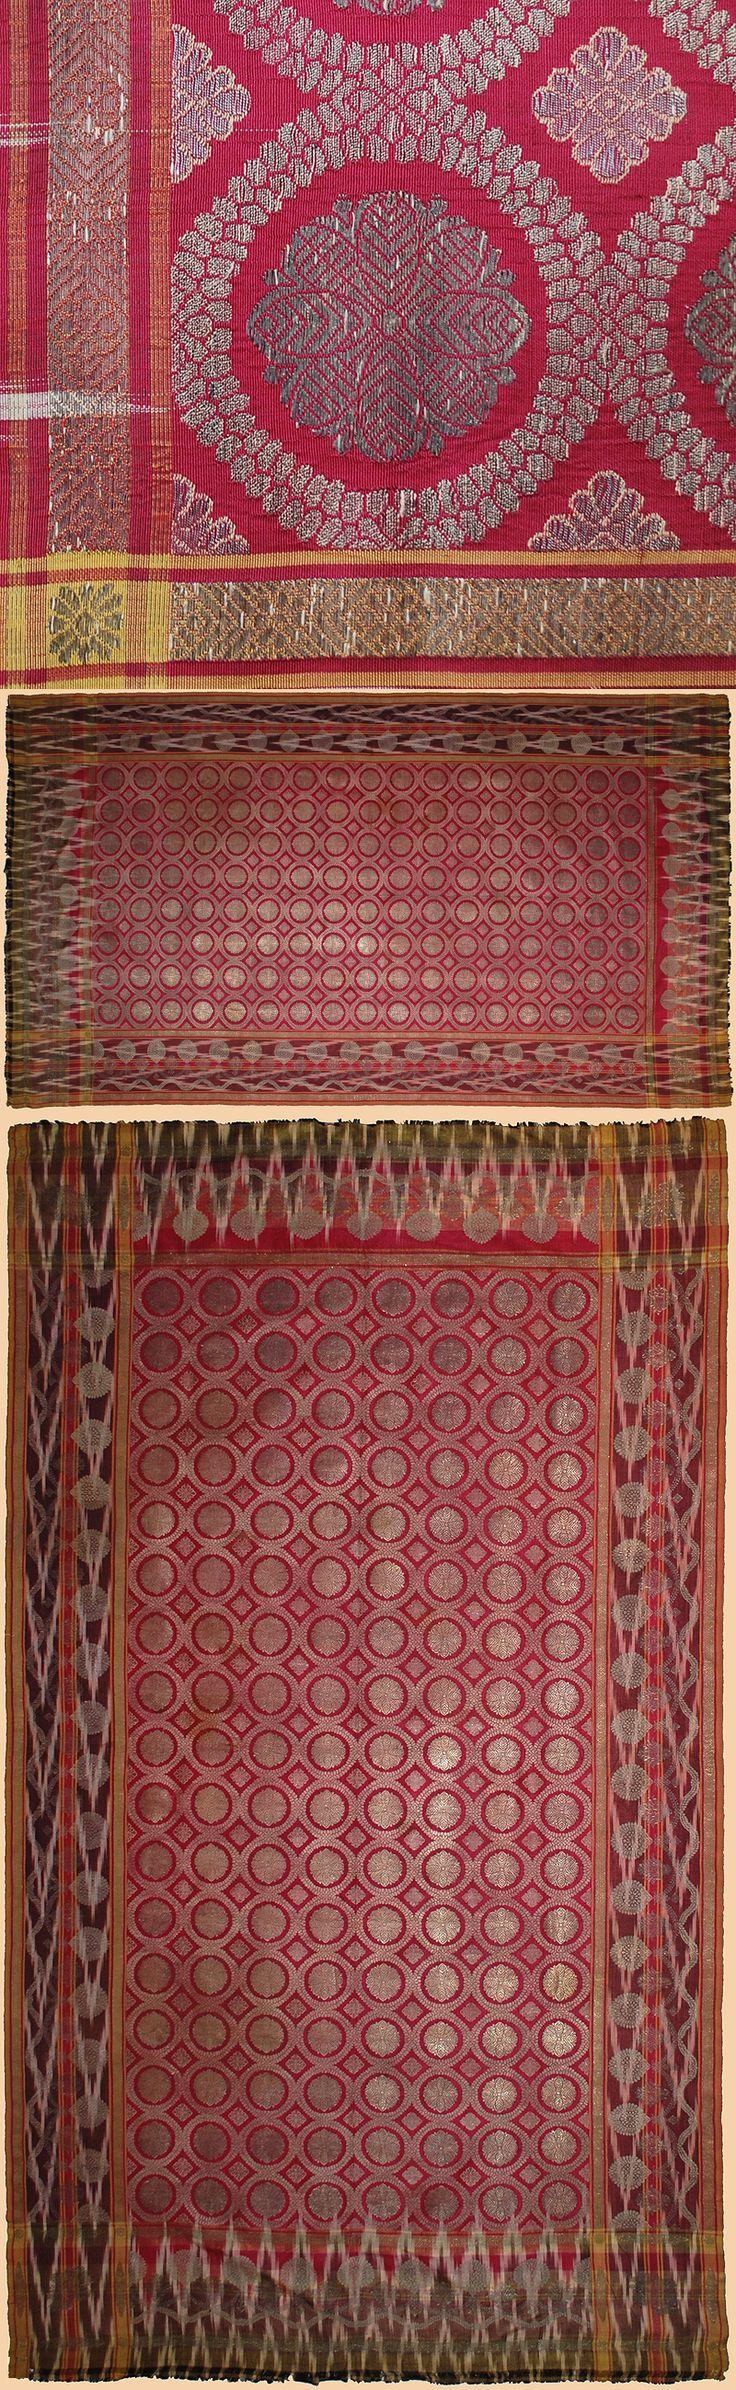 invitation to wedding ukrainian textiles and traditions%0A European Textiles  TextileAsArt com  Fine Antique Textiles and Antique  Textile Information